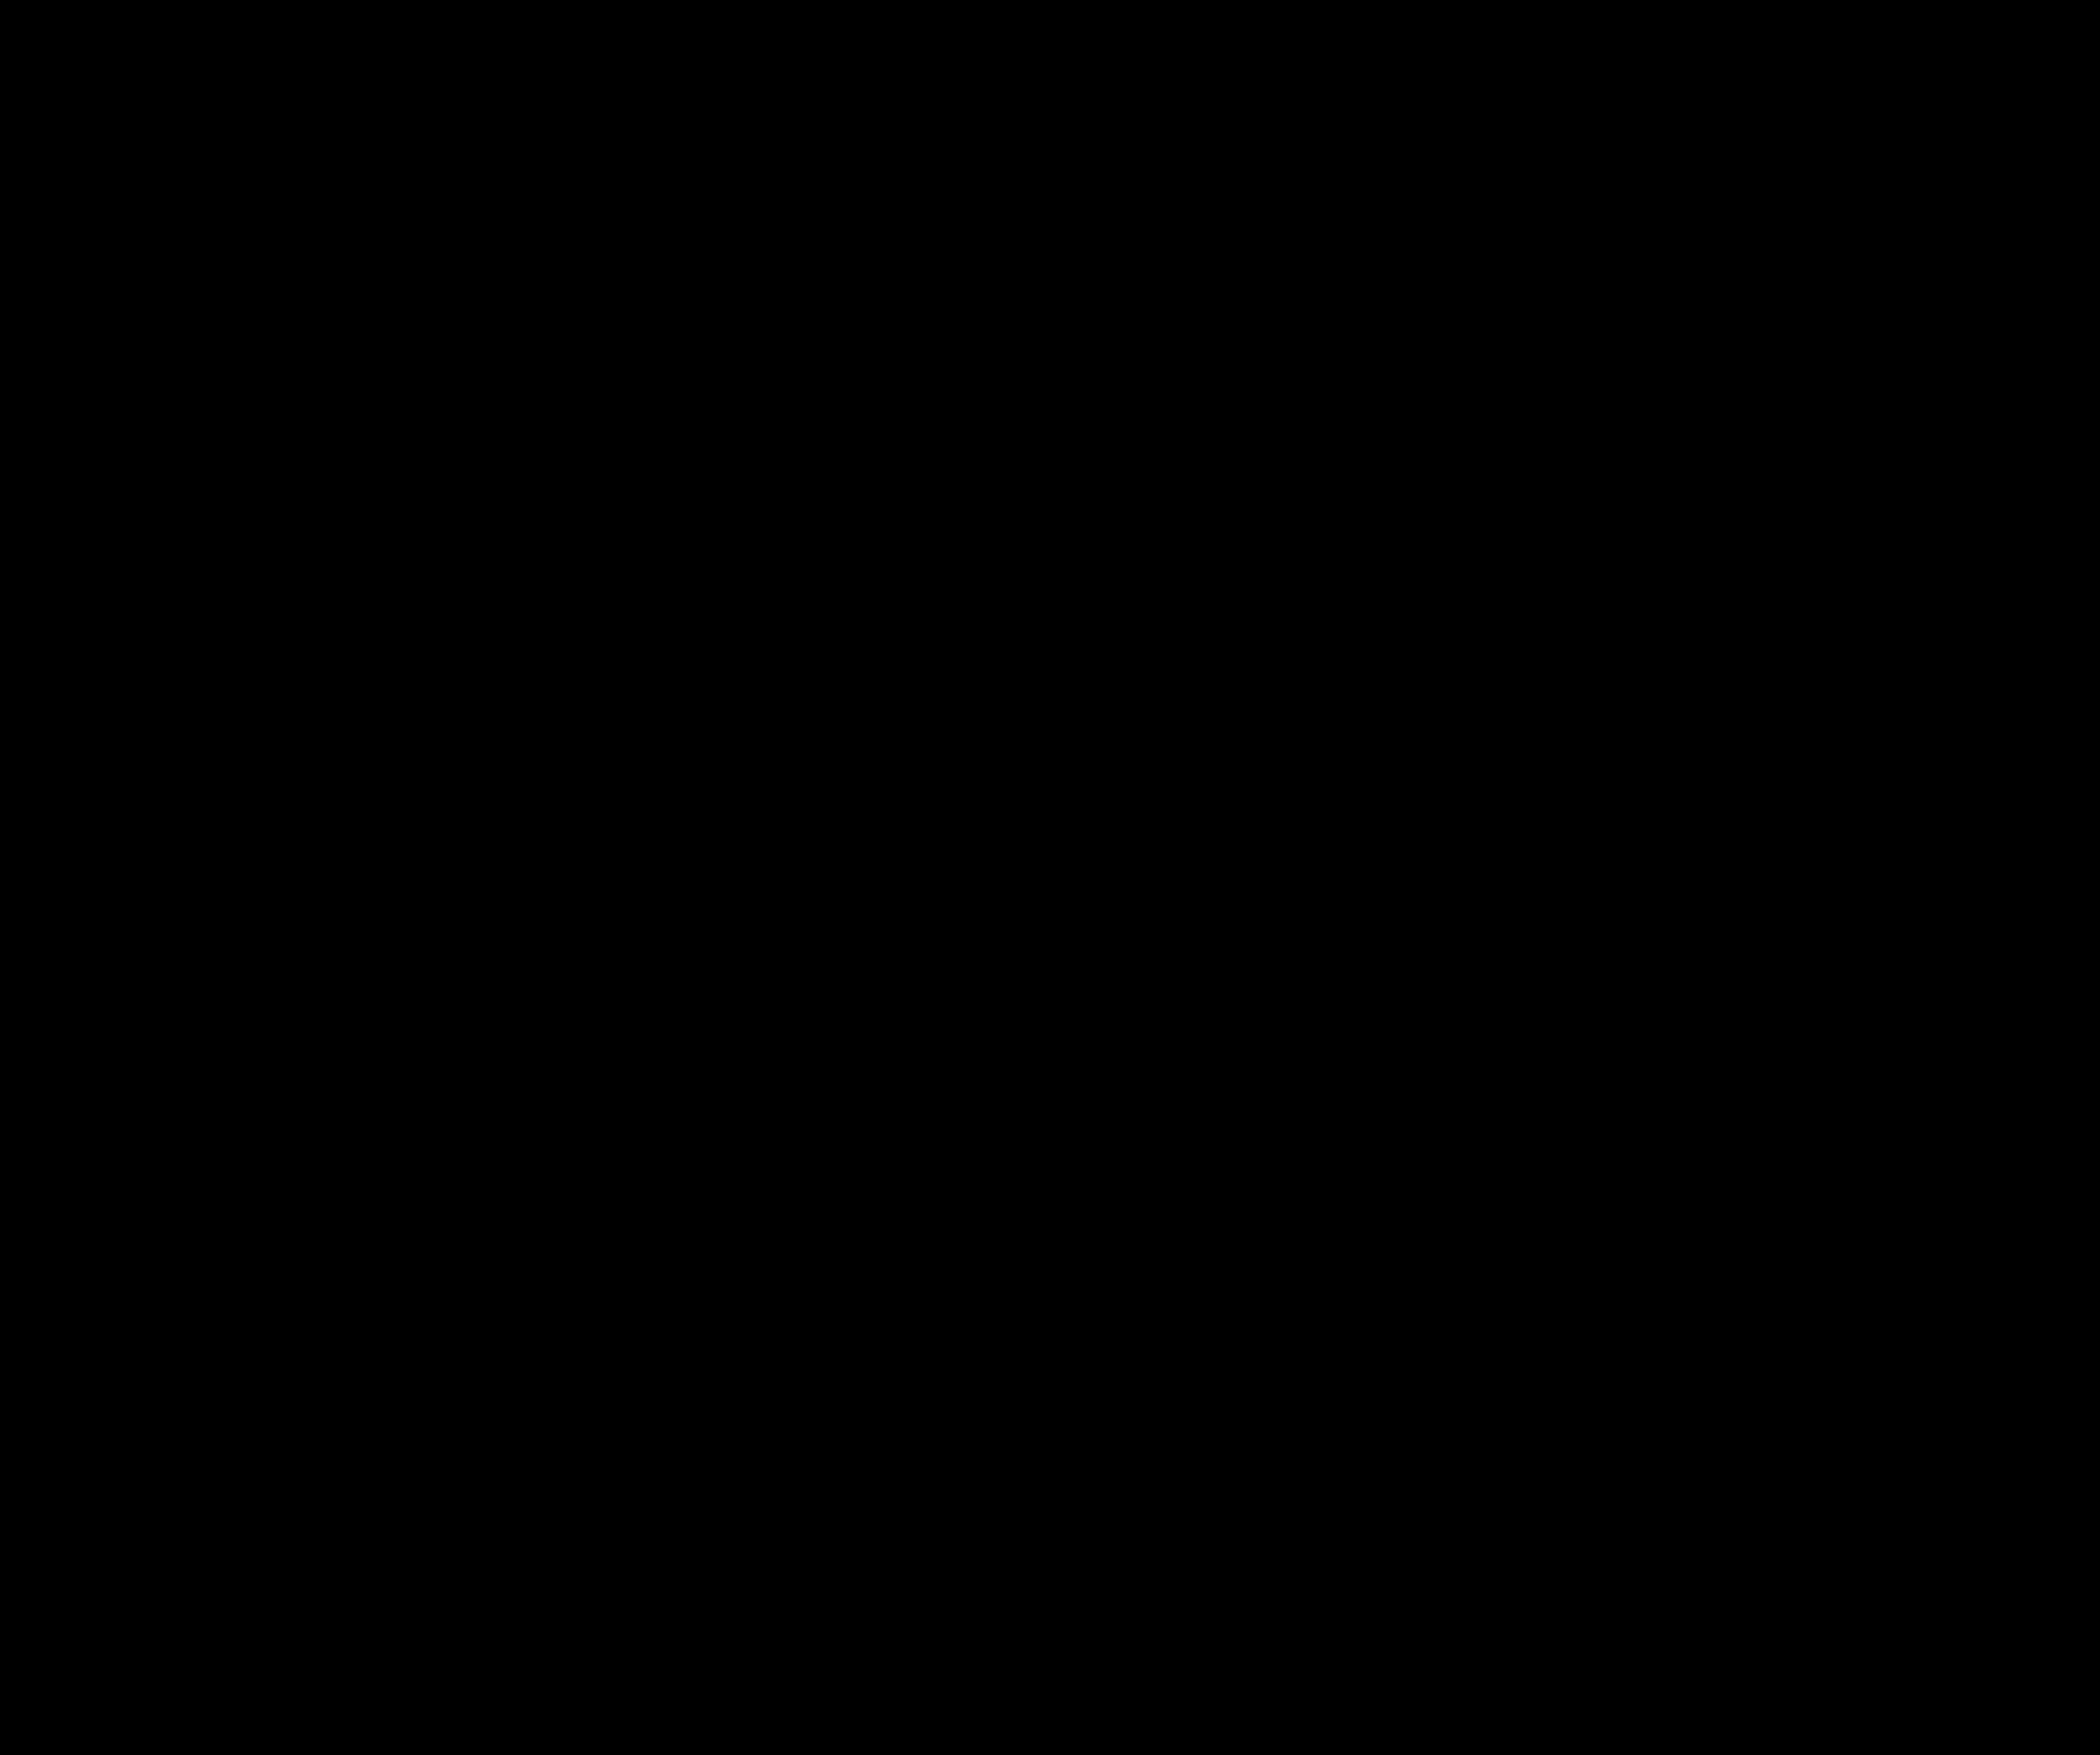 Heel PNG High Quality Image